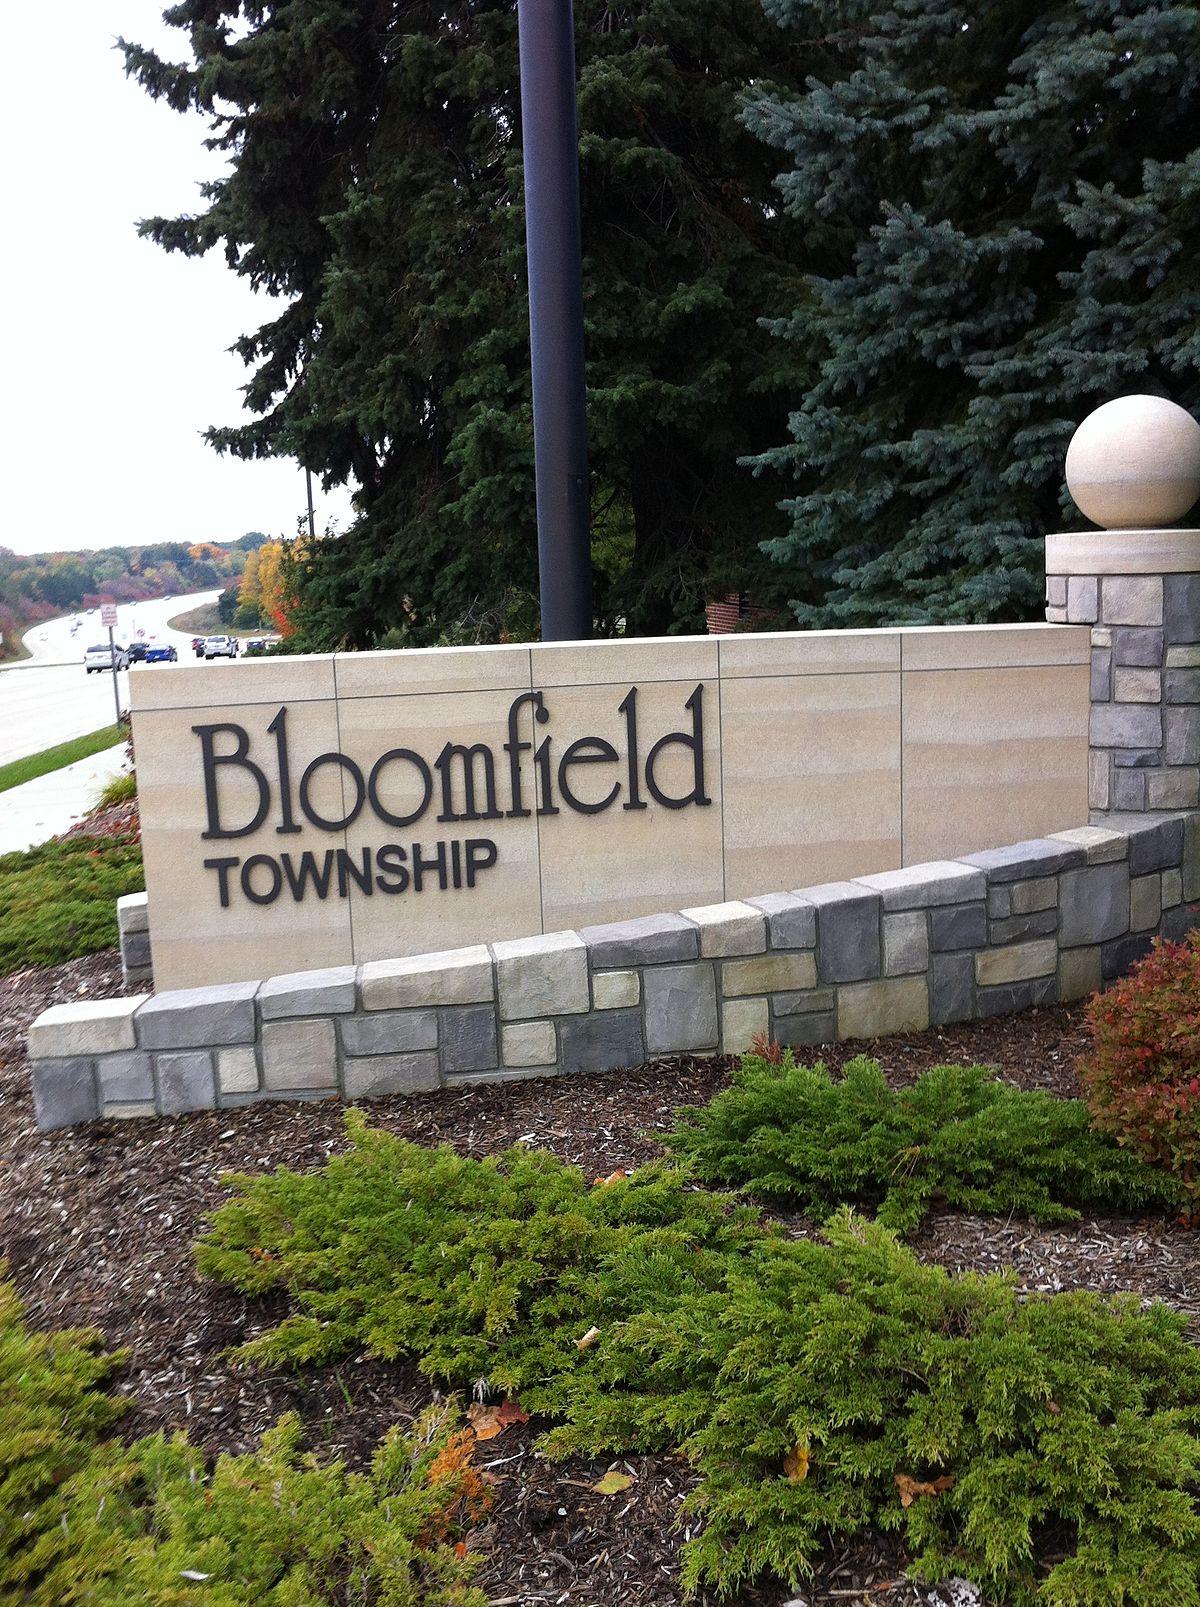 Bloomfield Township Oakland County Michigan Wikipedia